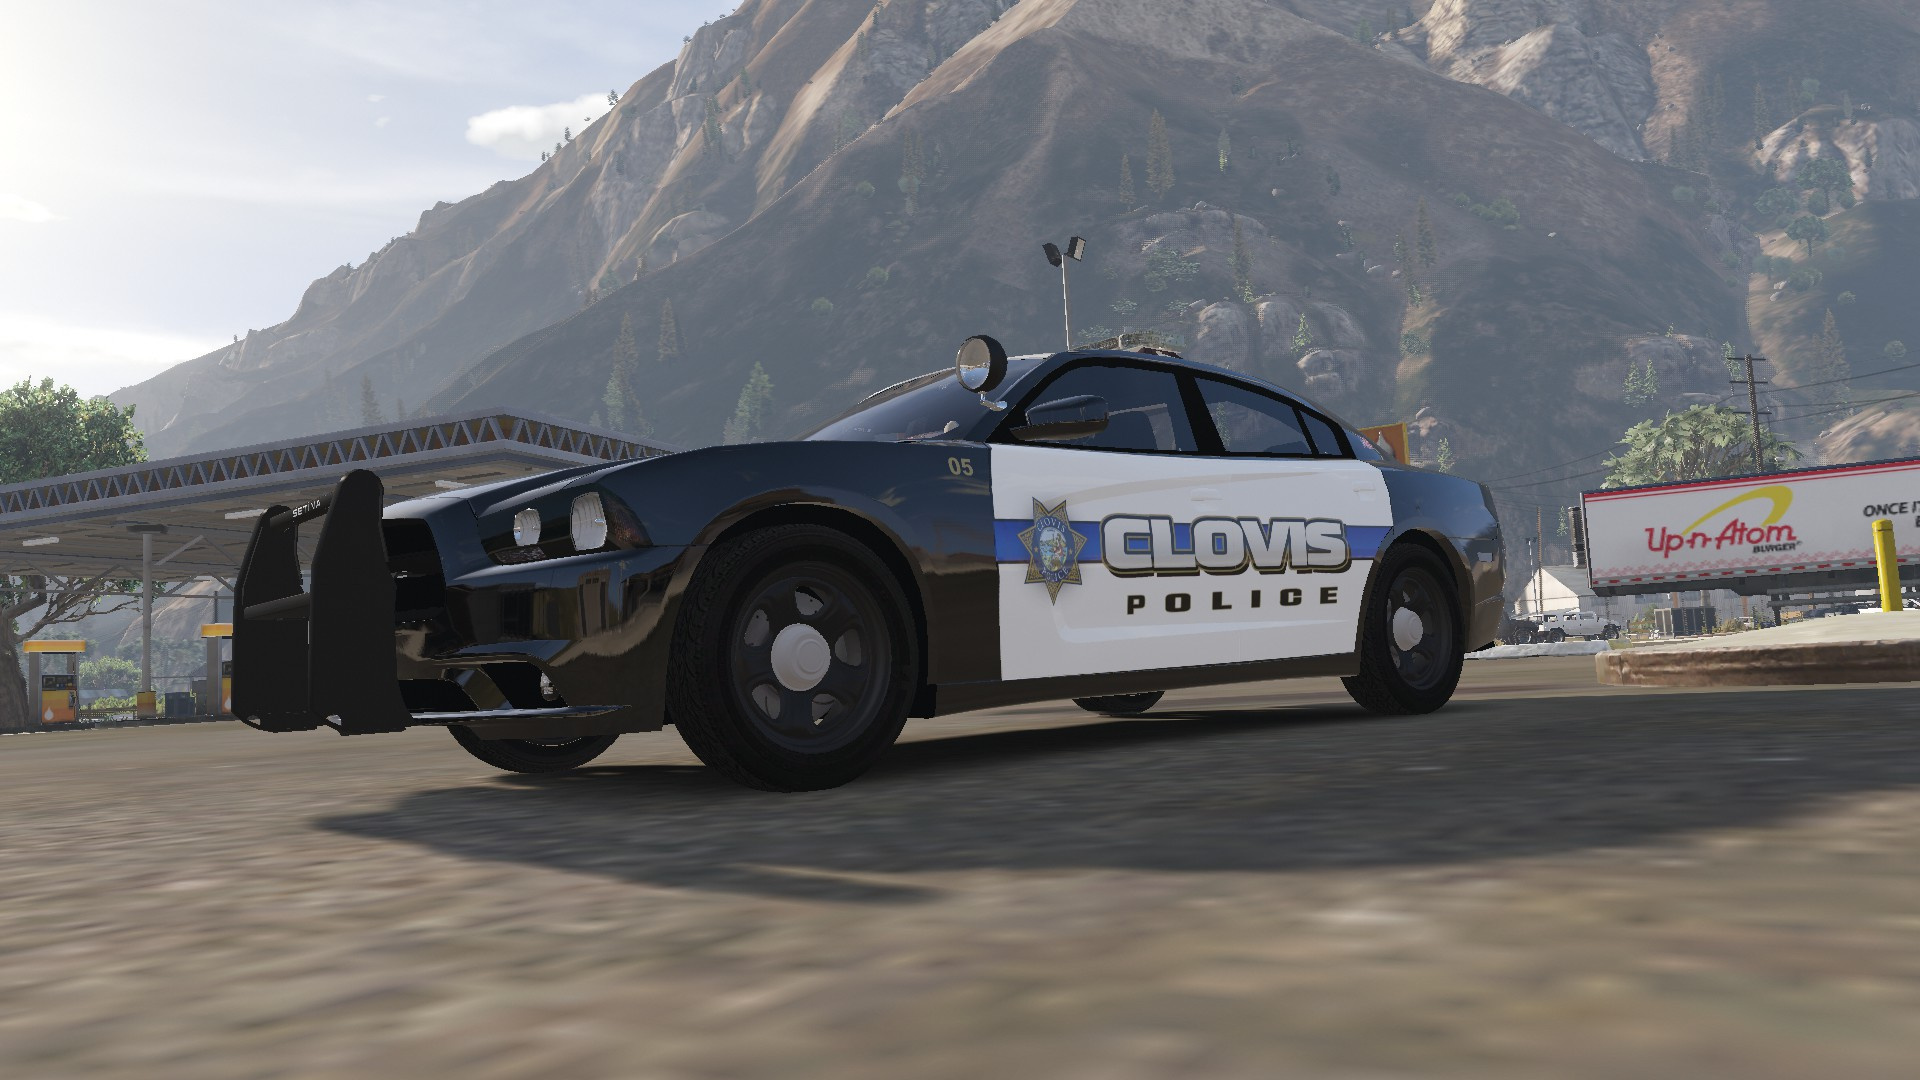 2017 Dodge Charger >> Clovis Police Department Charger Skin - GTA5-Mods.com